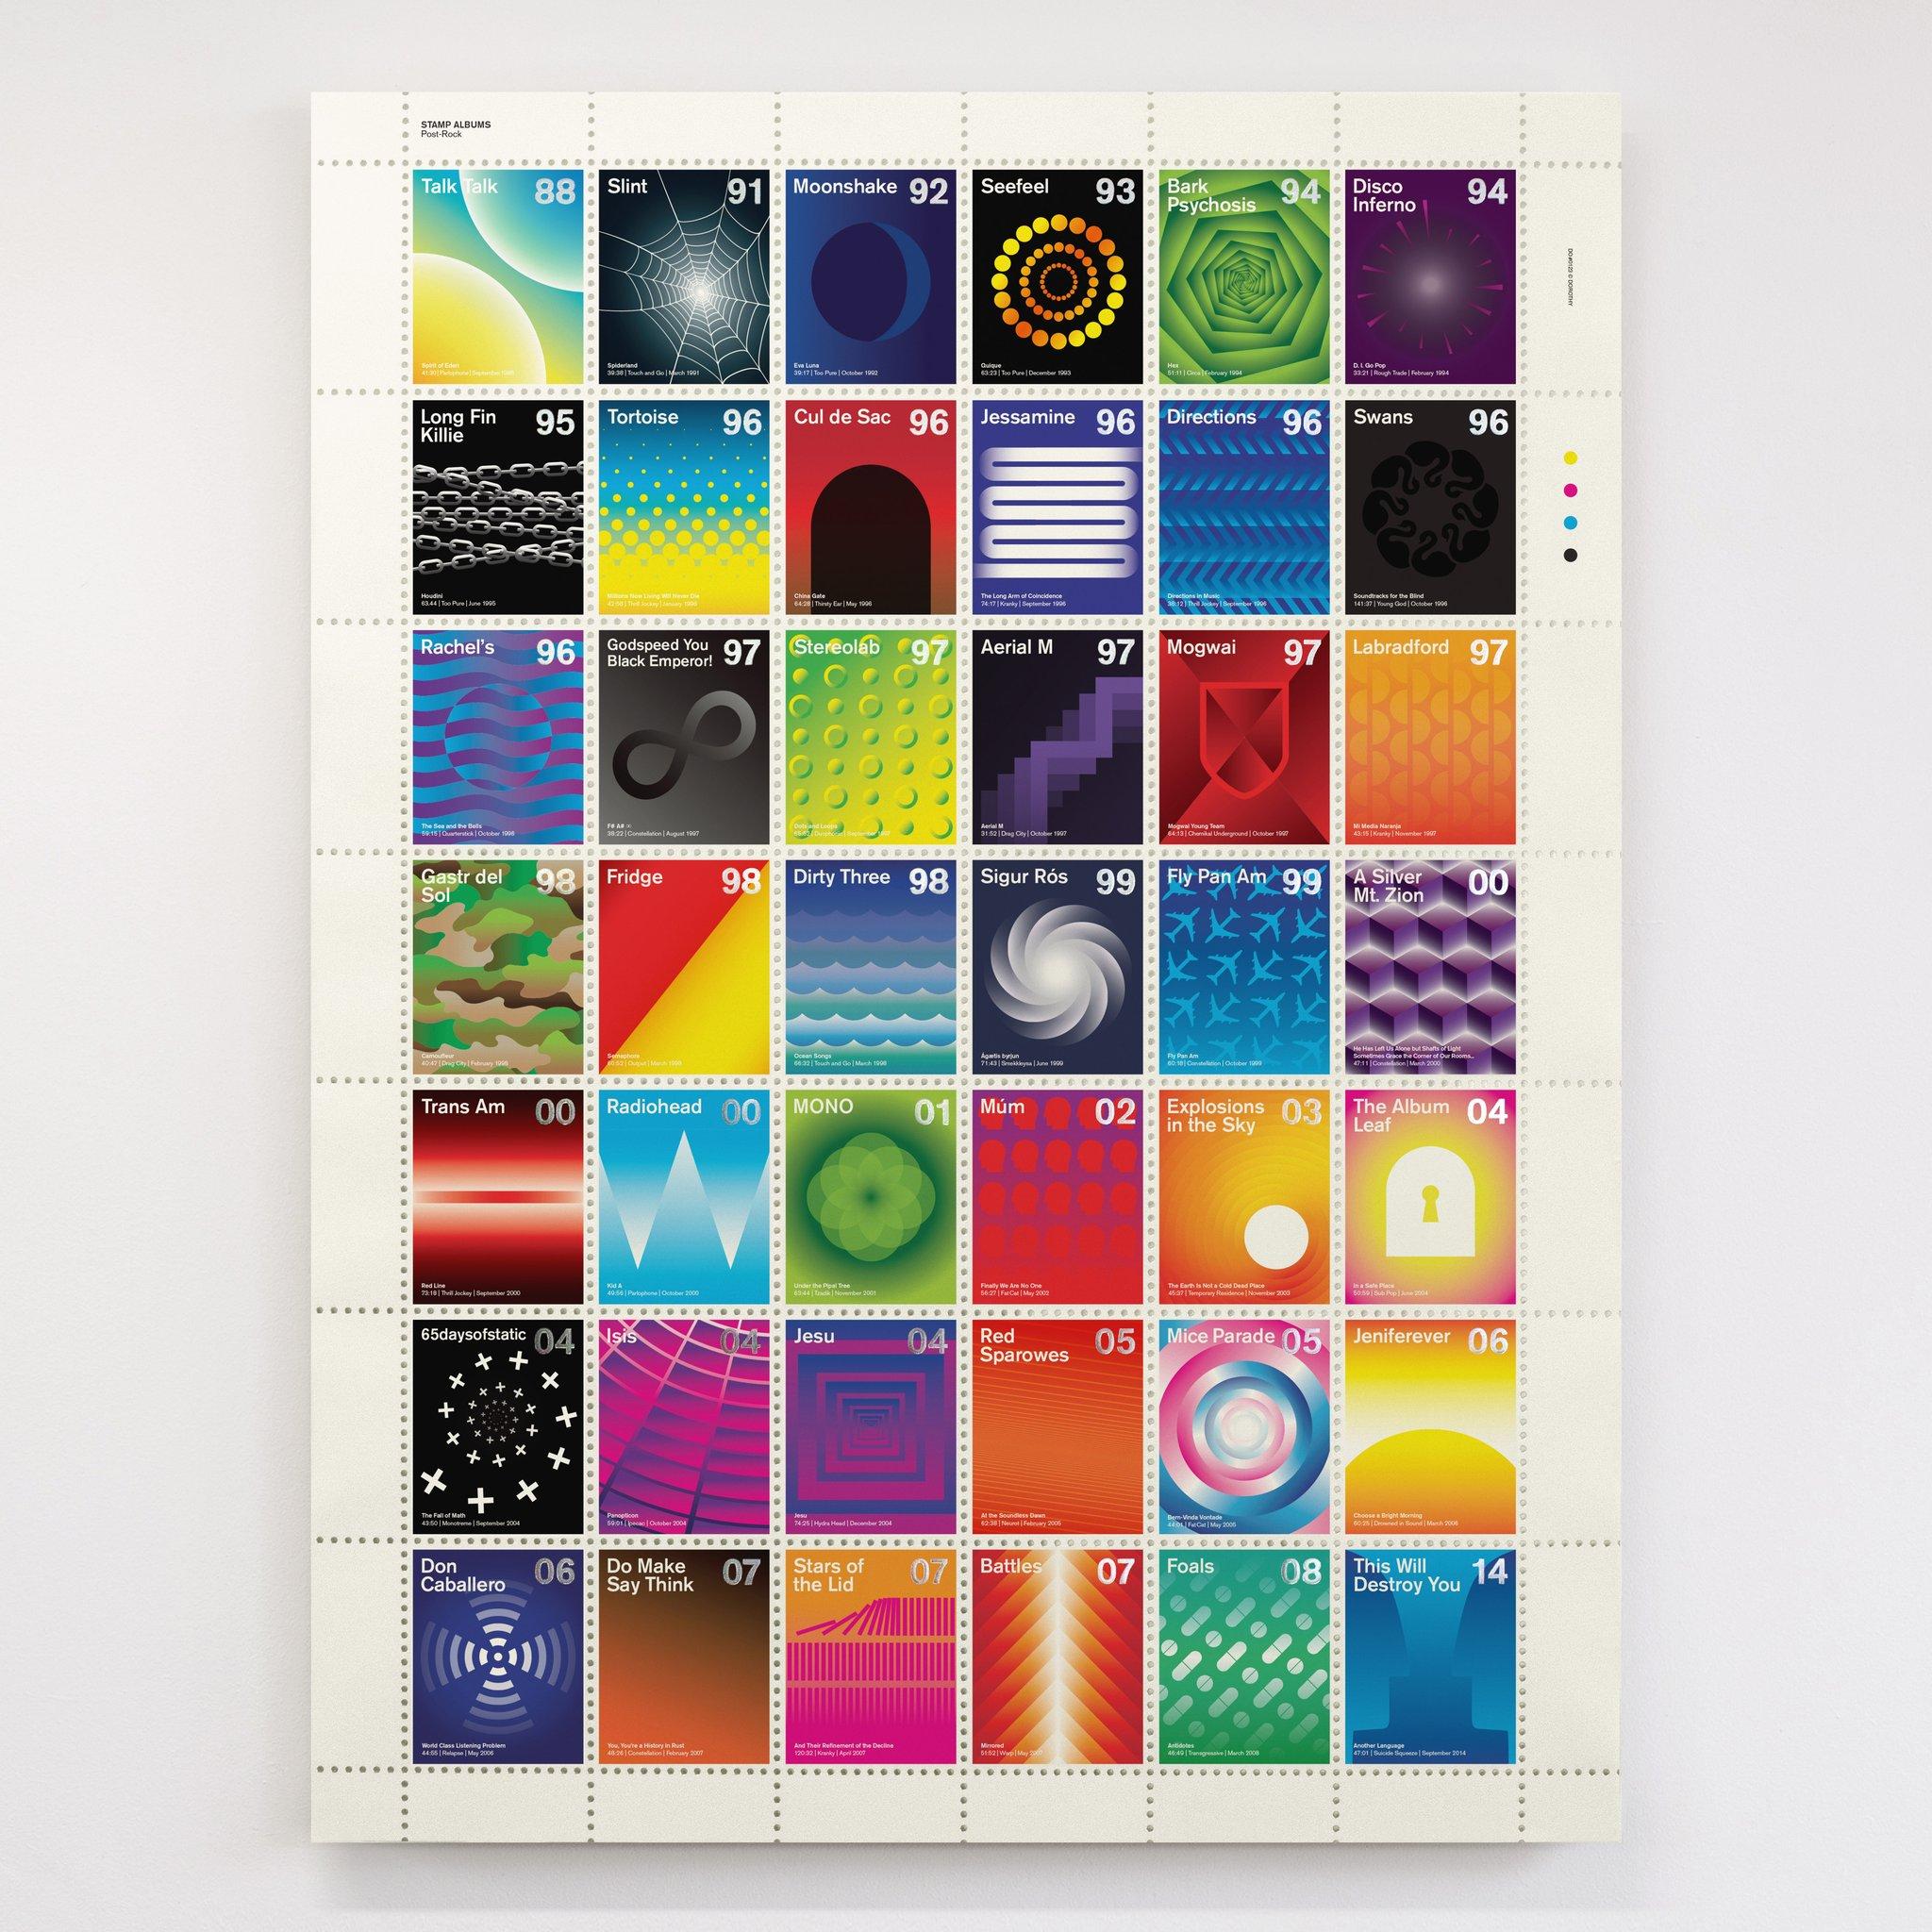 Stamp Albums Post Rock 1